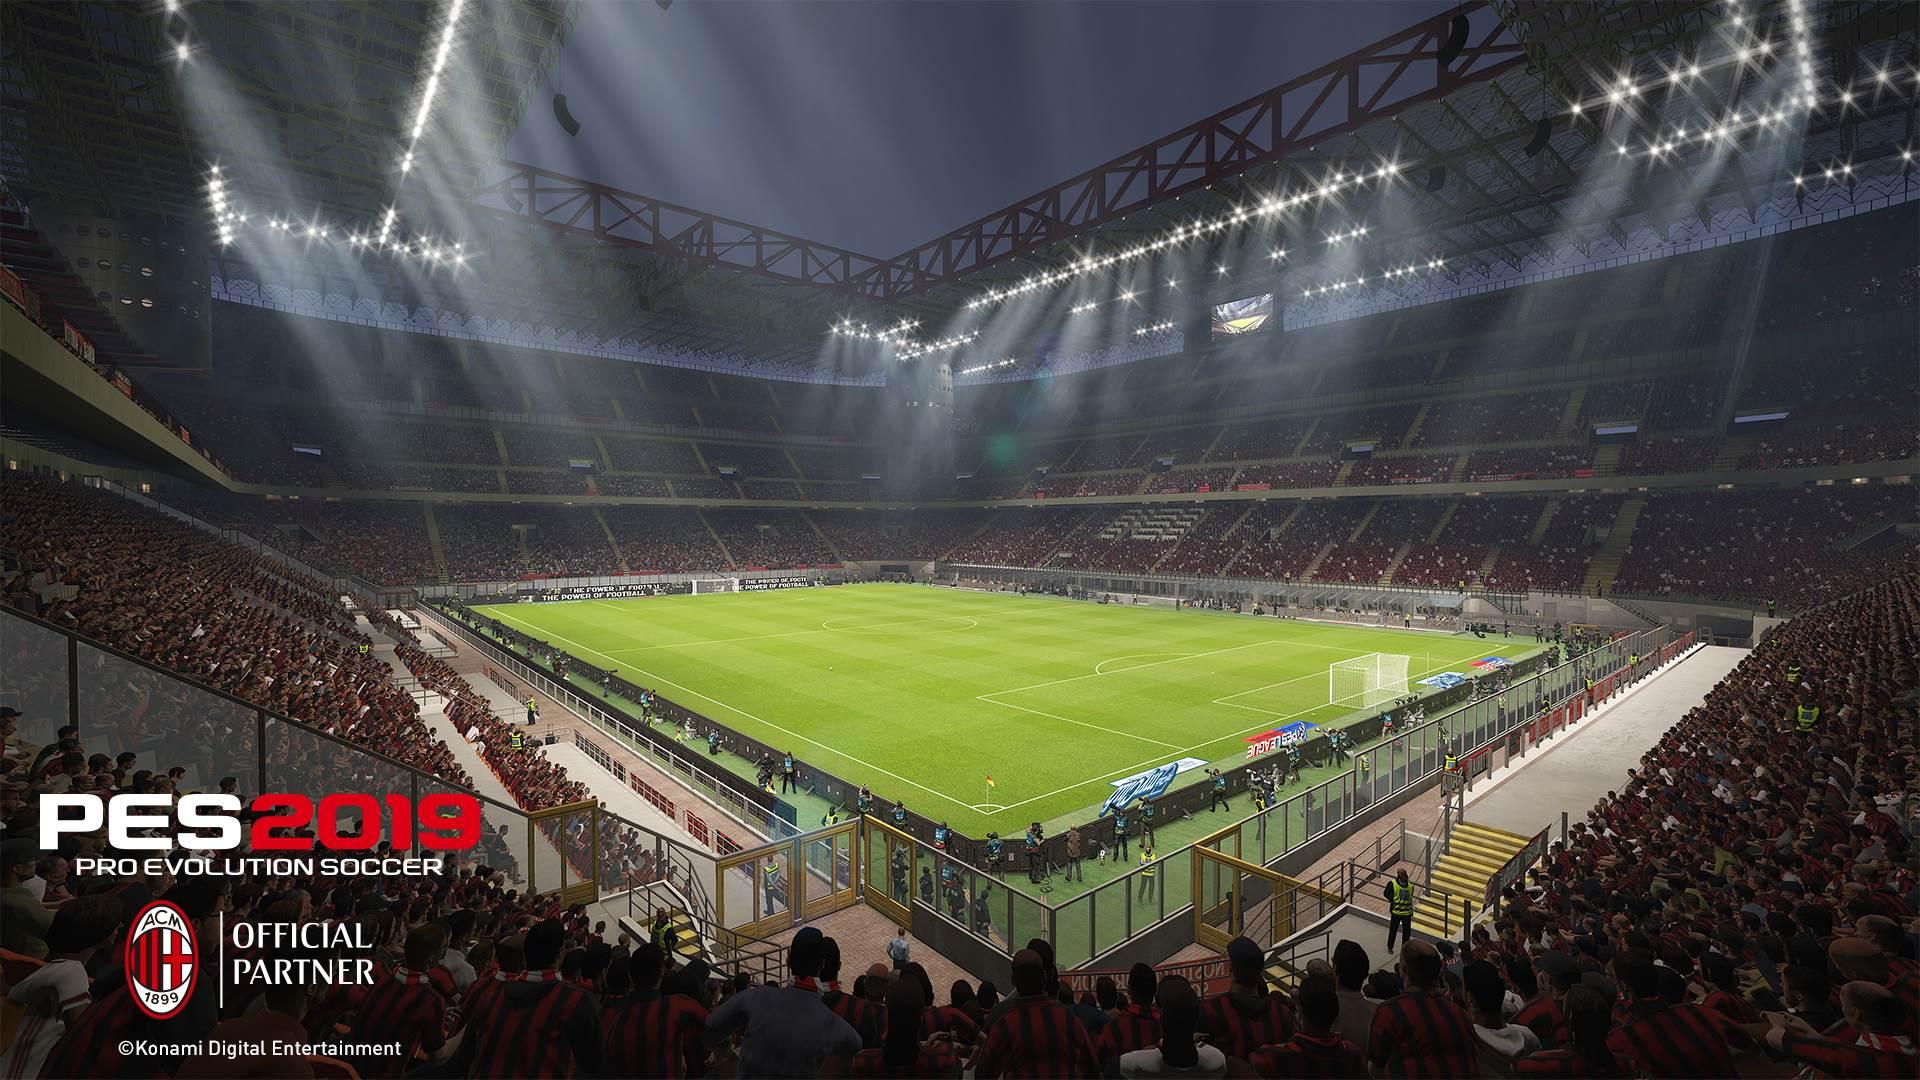 PES 2019 odustao od licenci, fokus na igri (VIDEO)